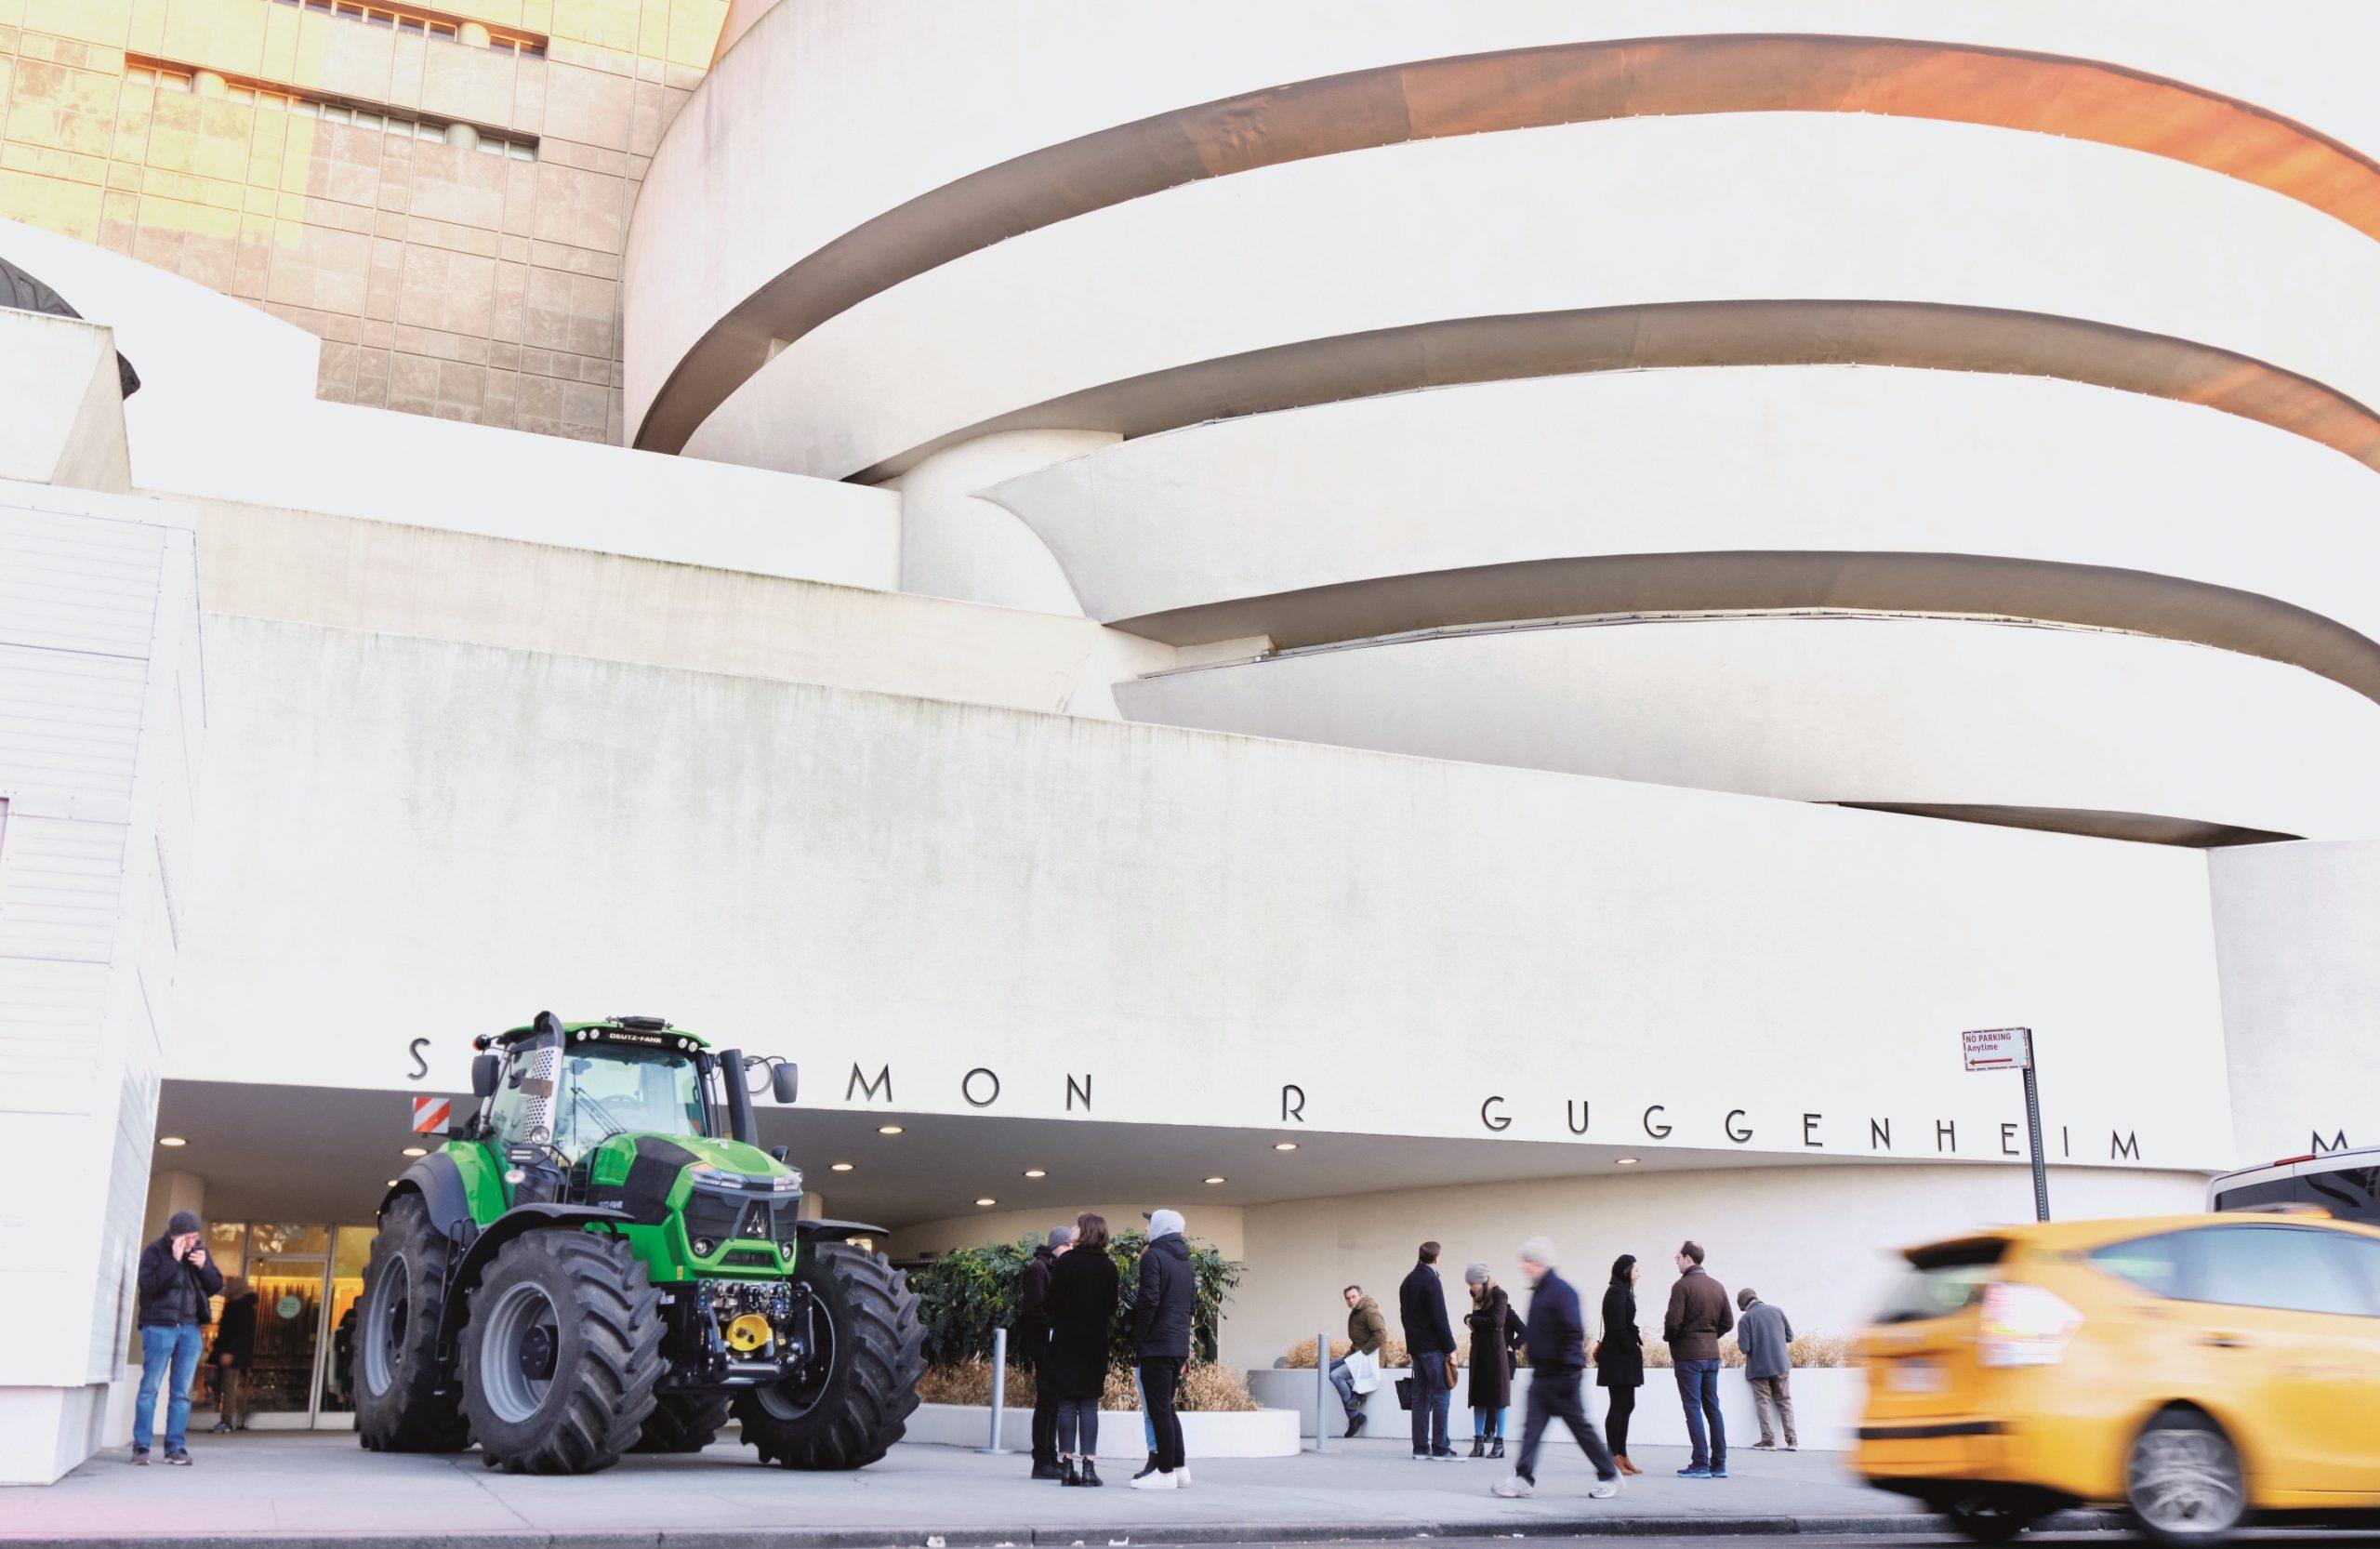 Deutz-Fahr protagonista al Guggenheim Museum di New York